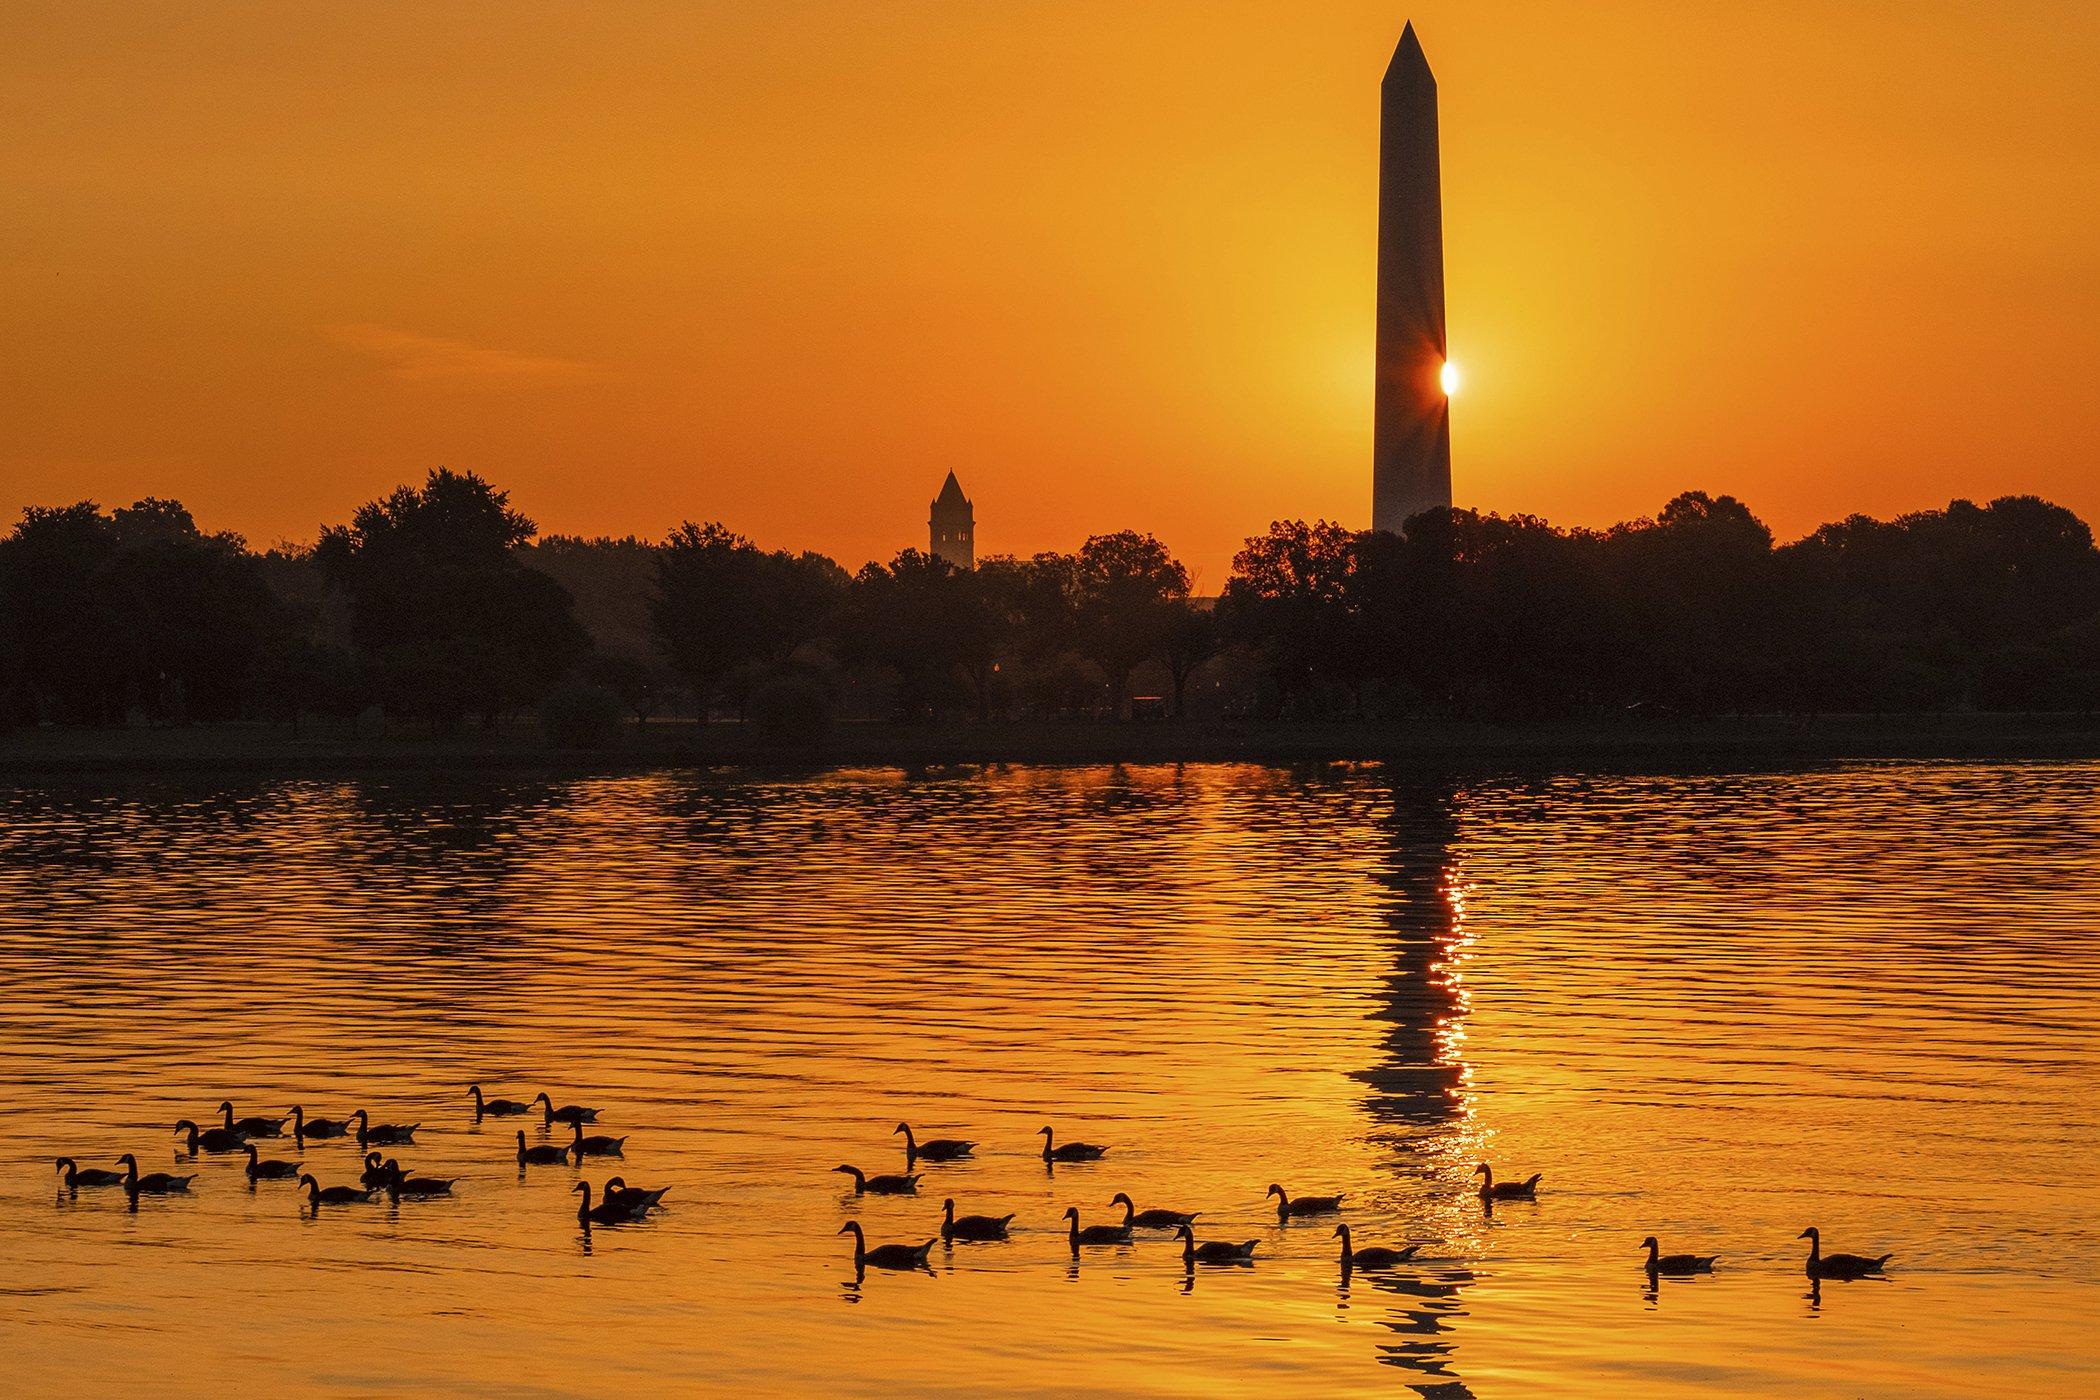 Environmental-Photos-July-WashingtonDC-Heat.jpg